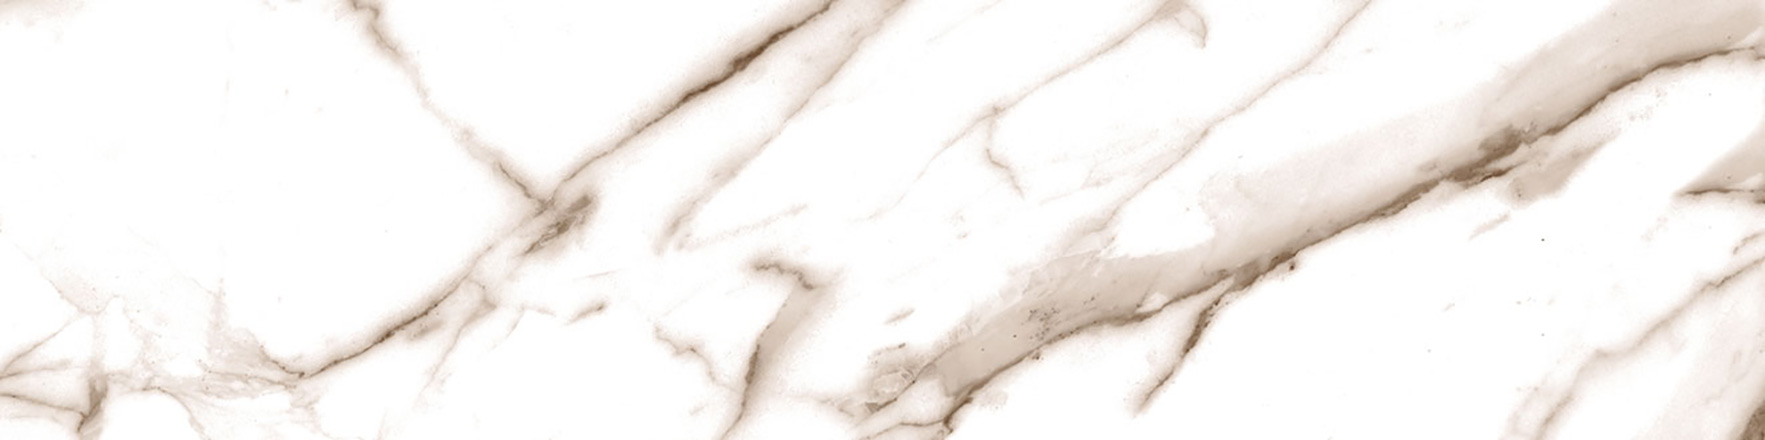 Venezia Bianco Pulido24,5x98,2